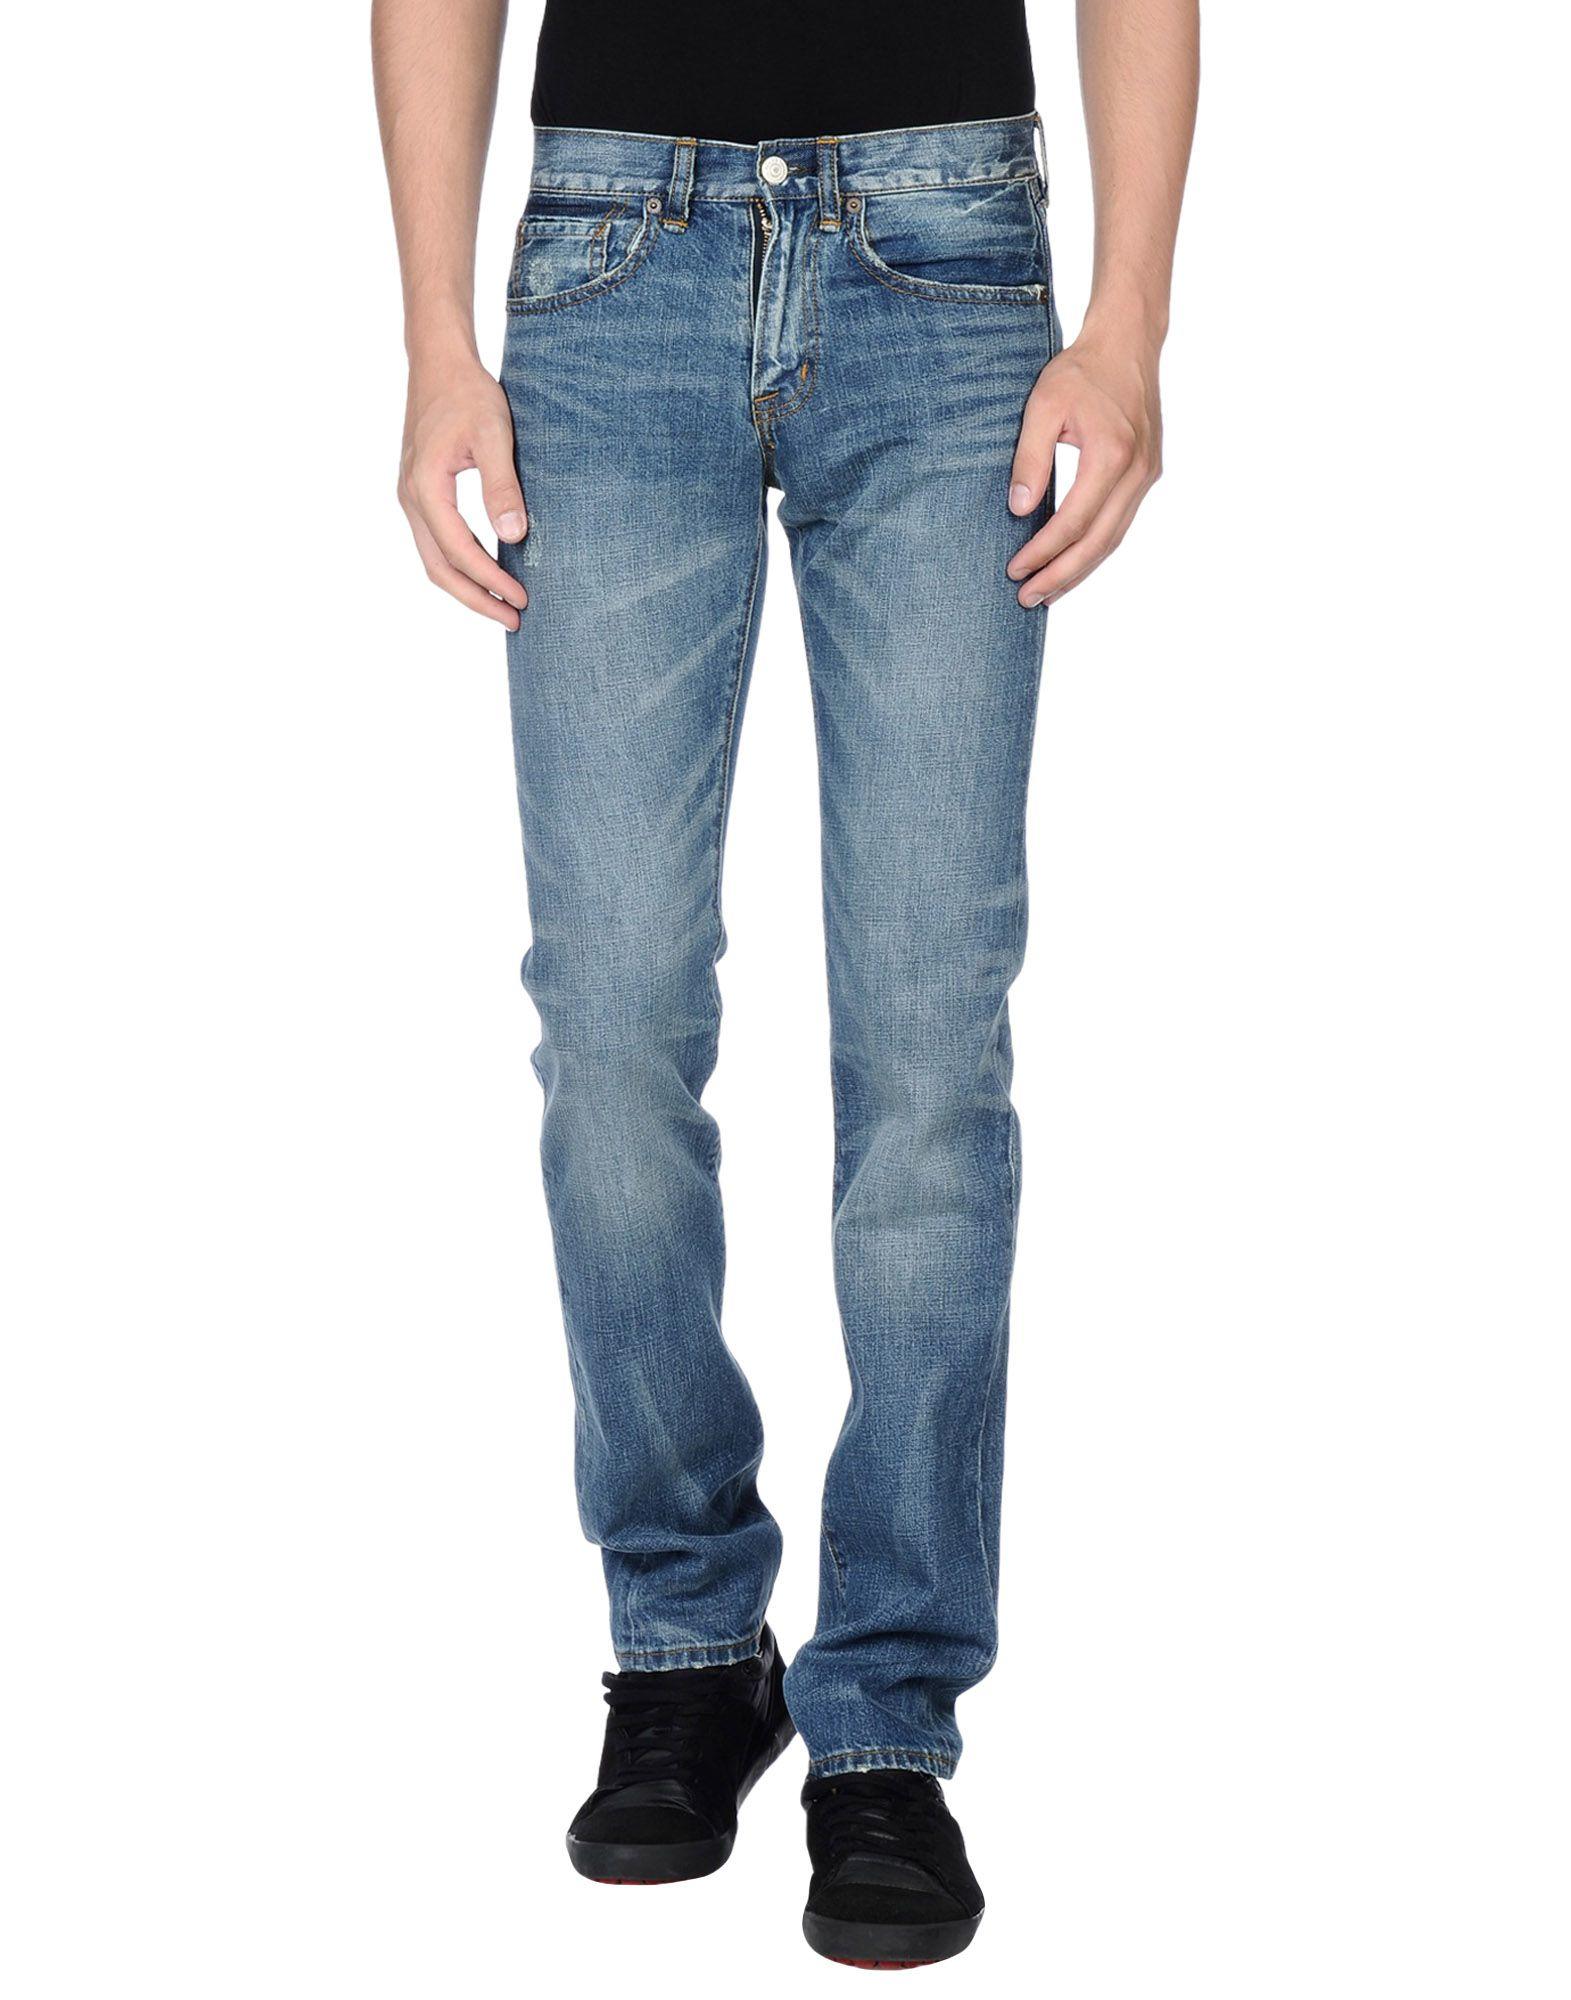 denim supply ralph lauren denim trousers in blue for men. Black Bedroom Furniture Sets. Home Design Ideas